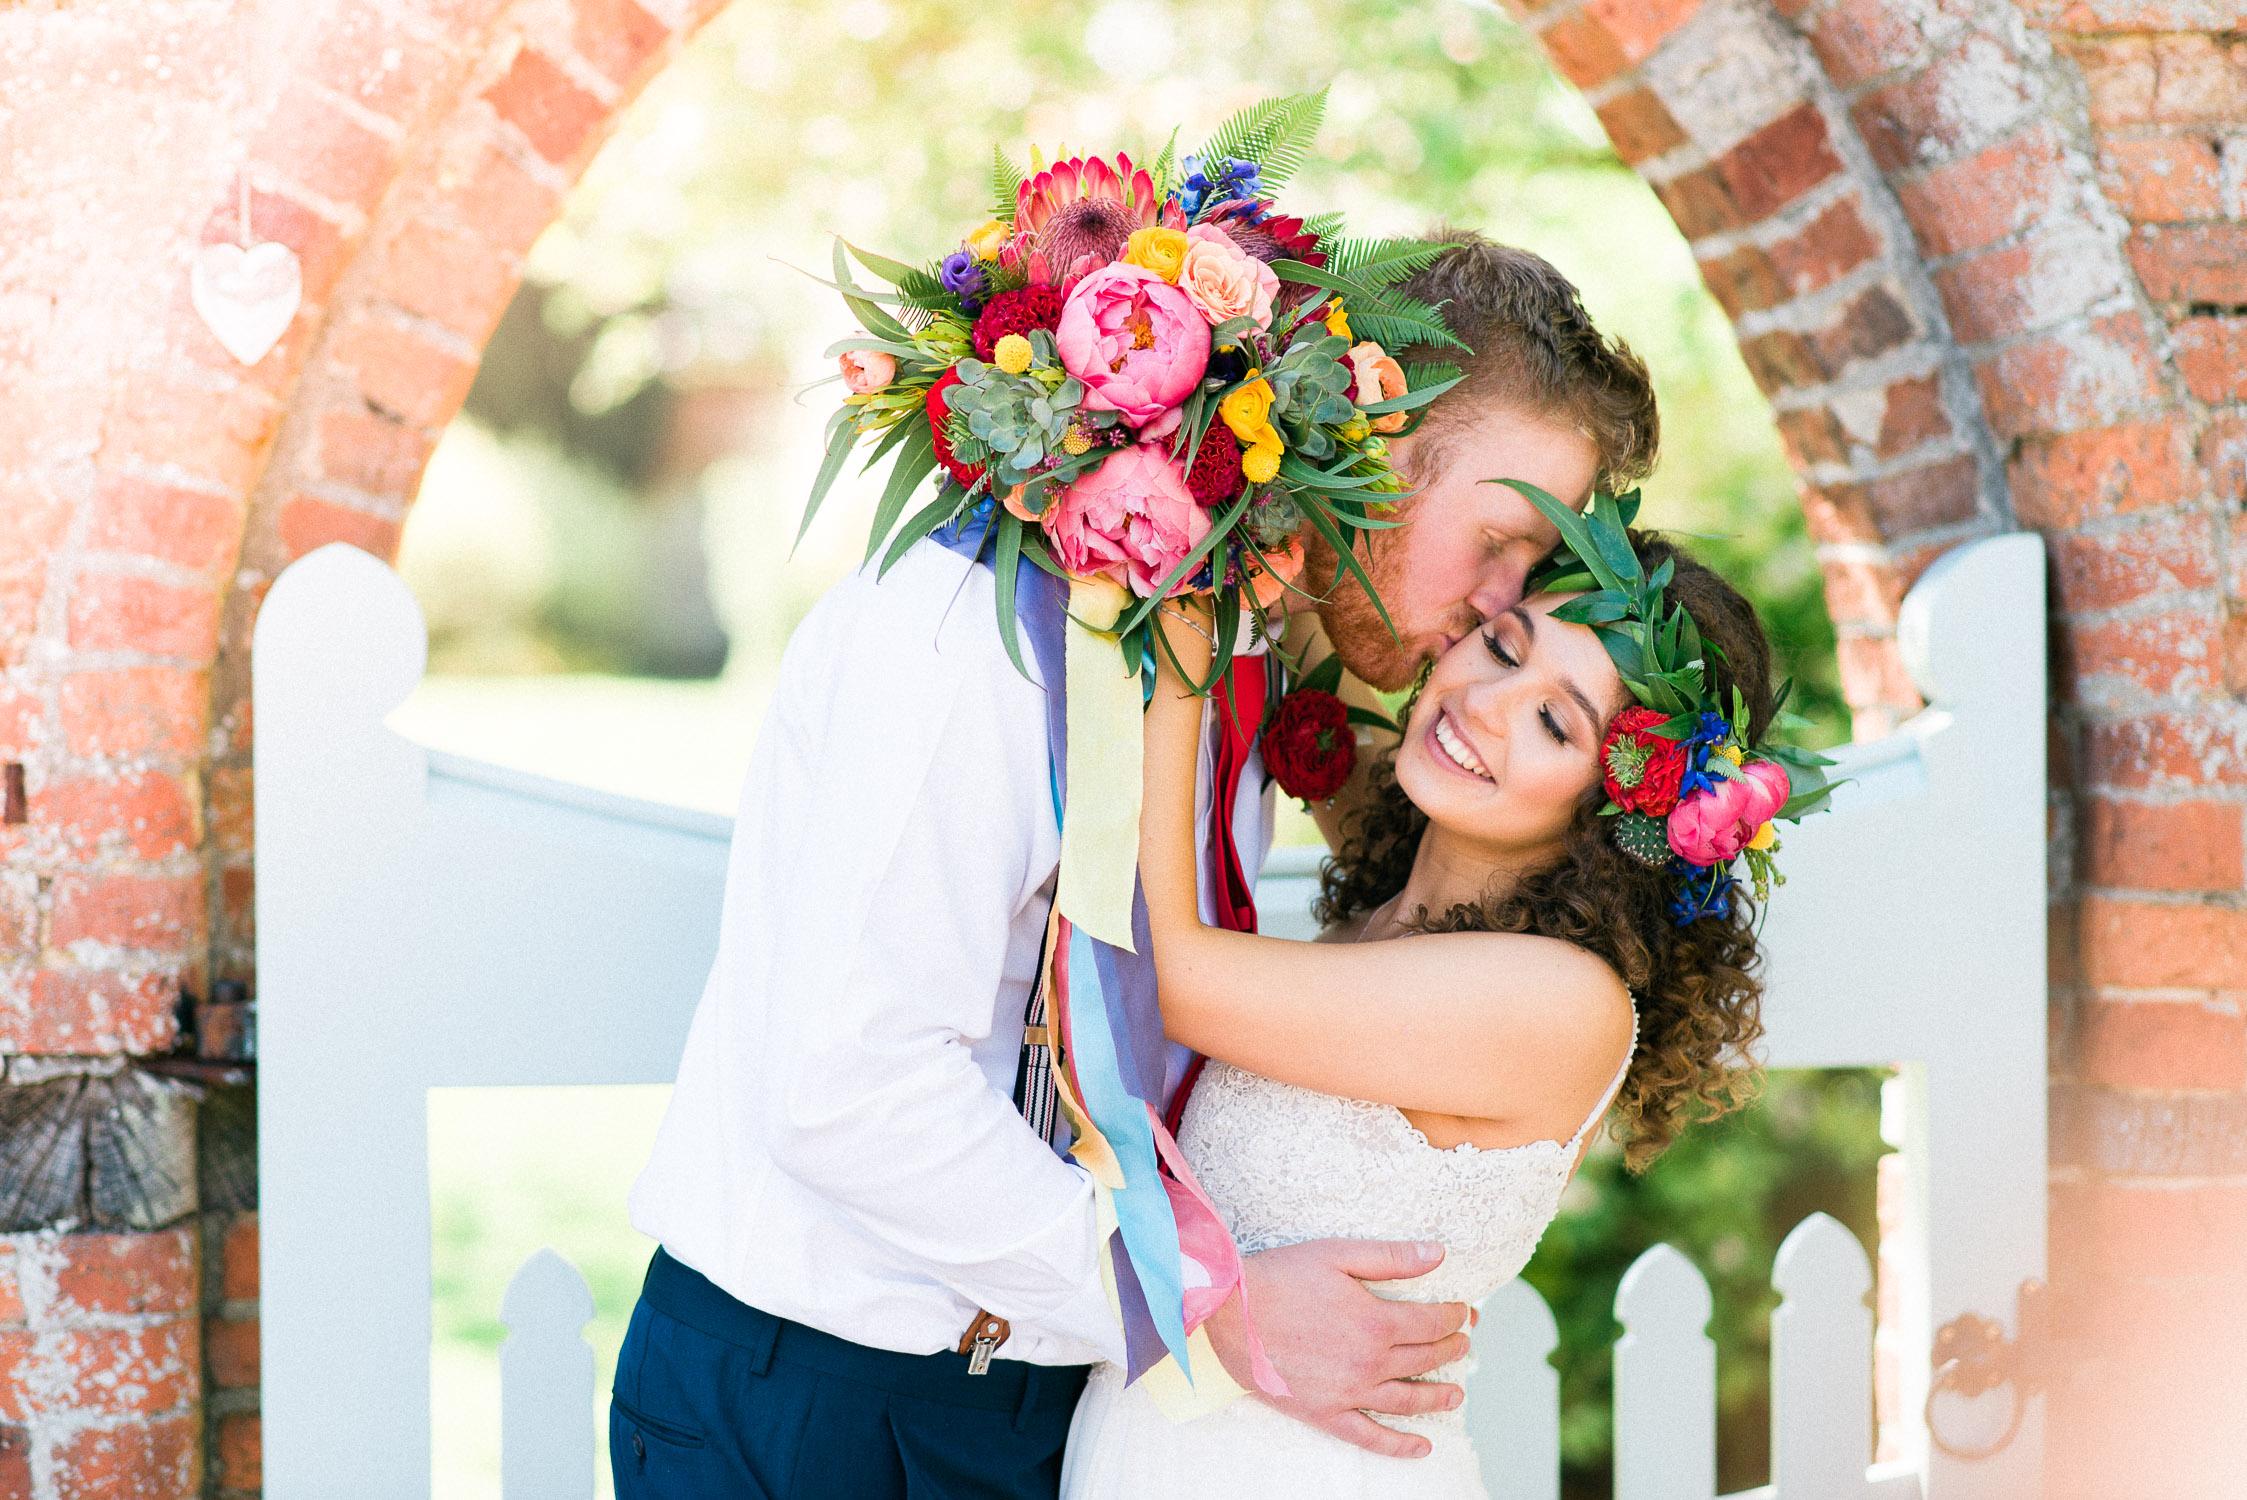 liverpool wedding photography (36 of 42)